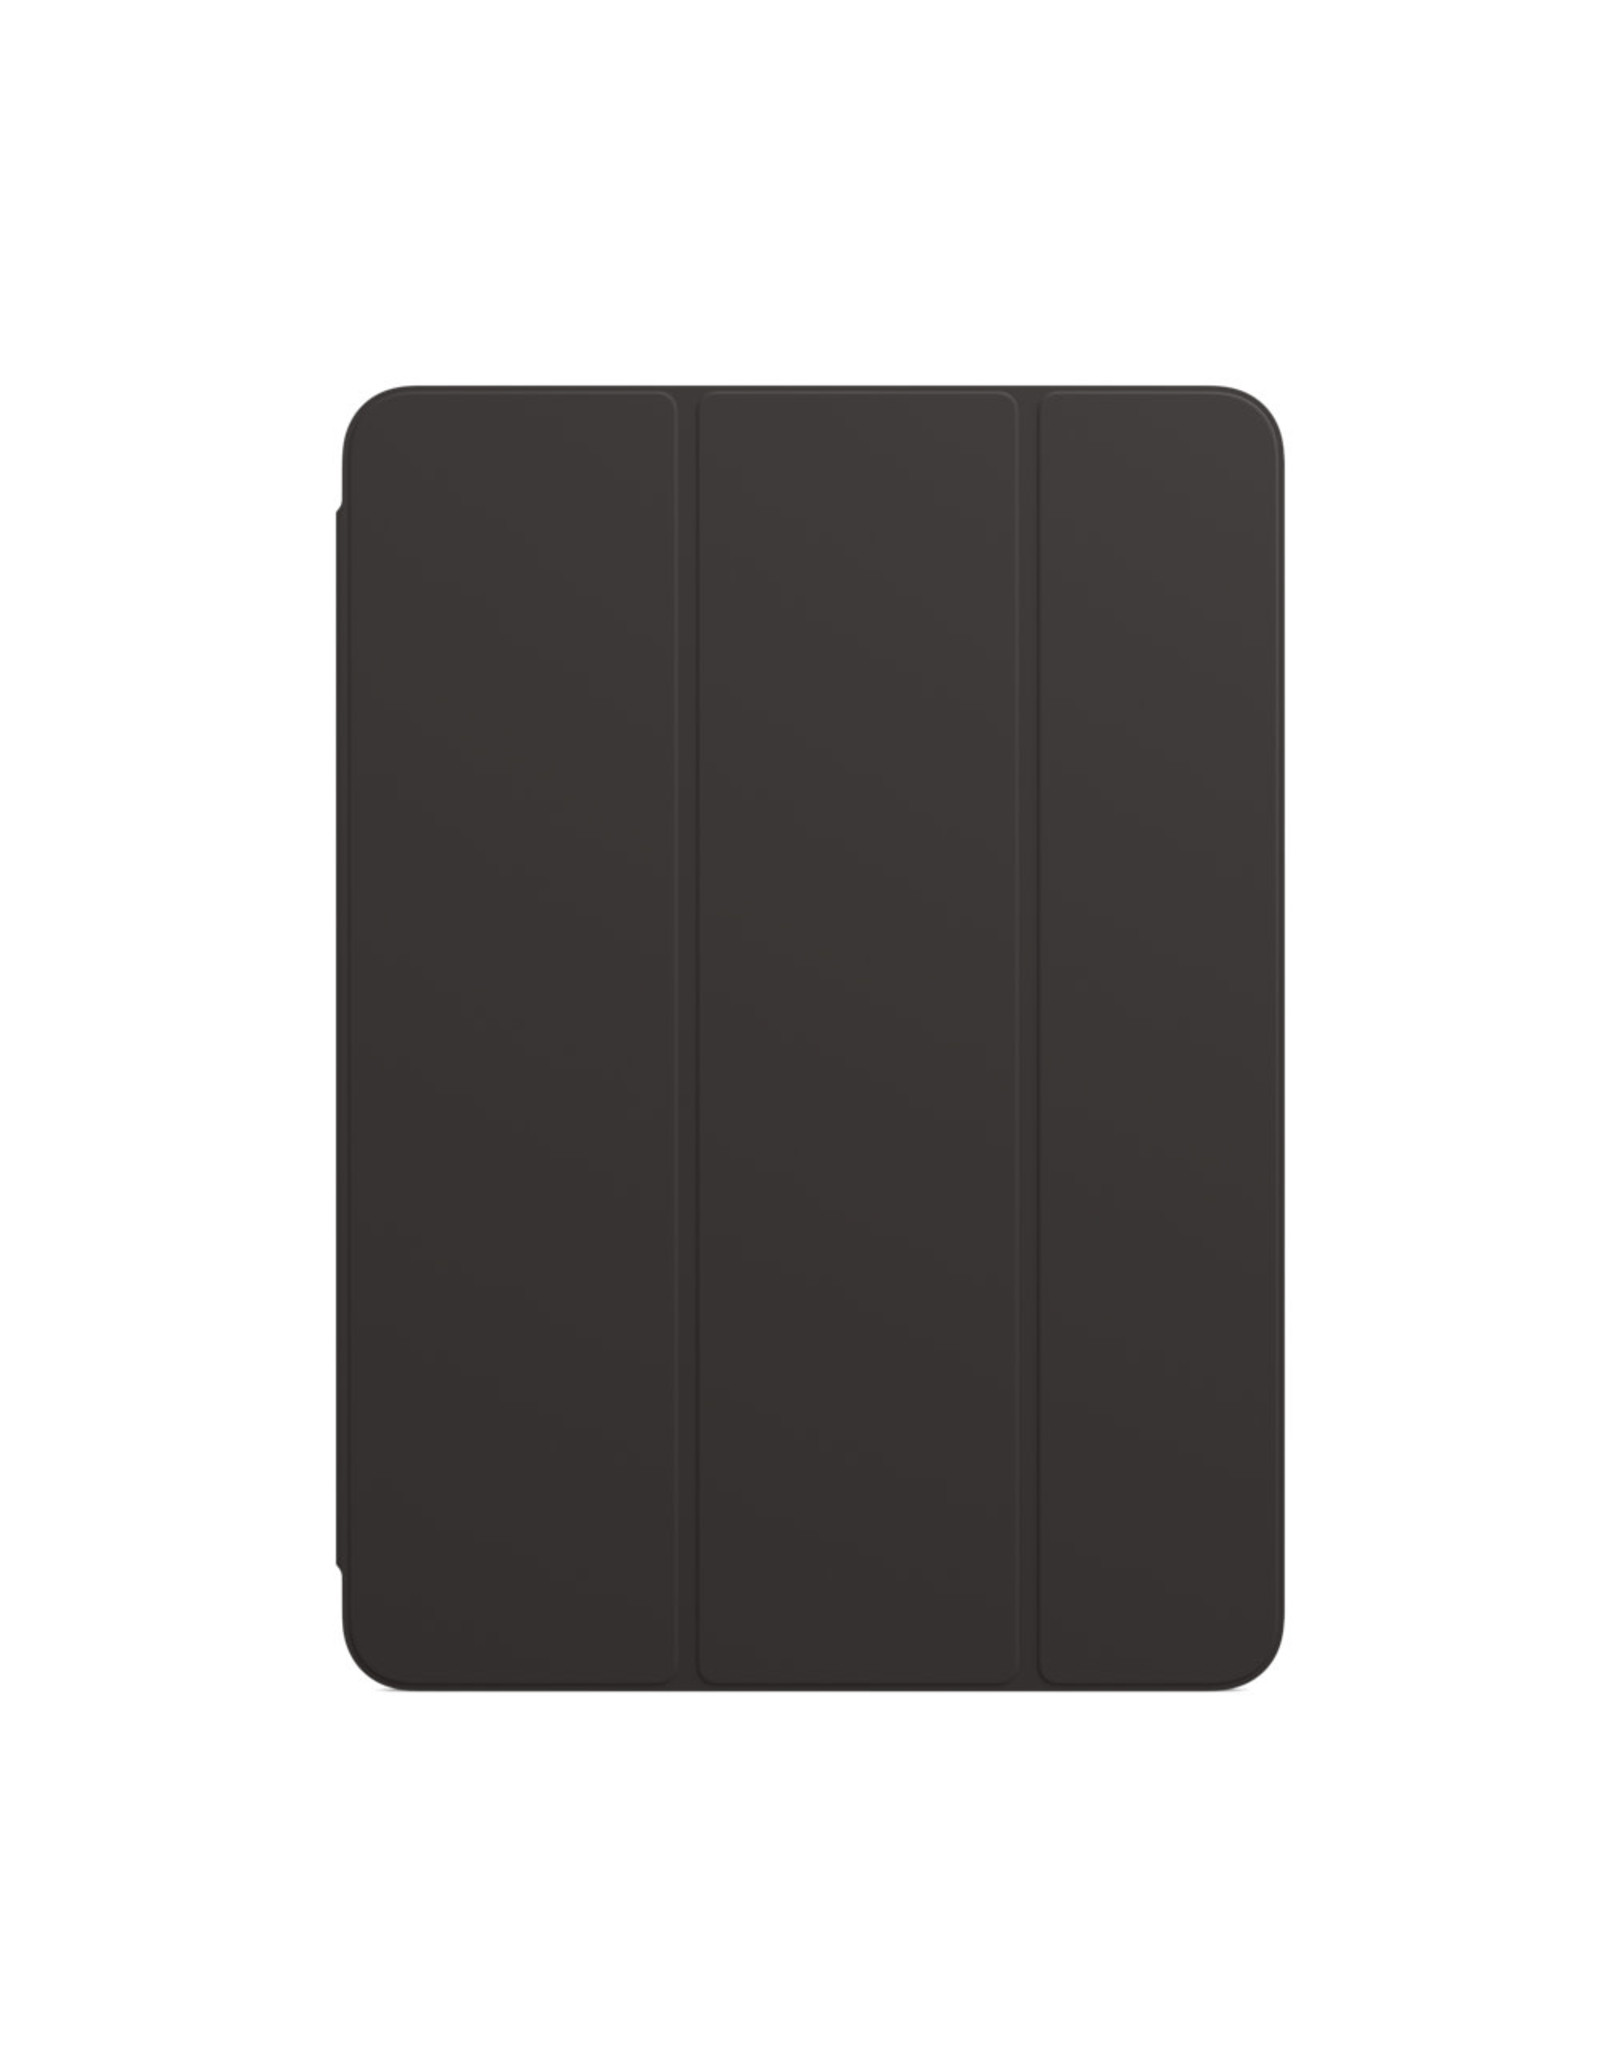 Apple Apple Smart Folio for iPad Air (4th generation) - Black